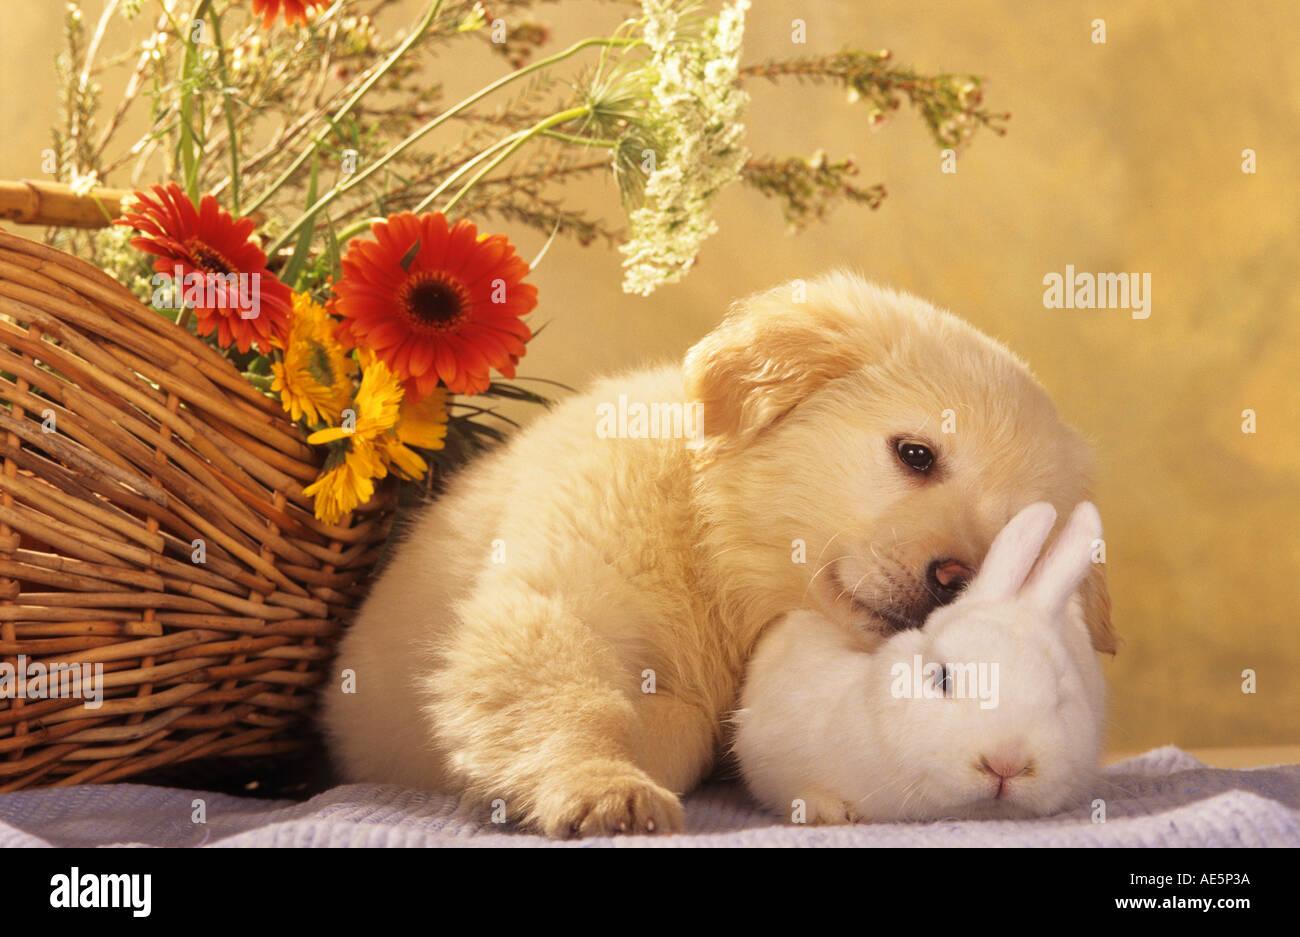 animal friendship: Golden Retriever dog puppy and dwarf rabbit - Stock Image